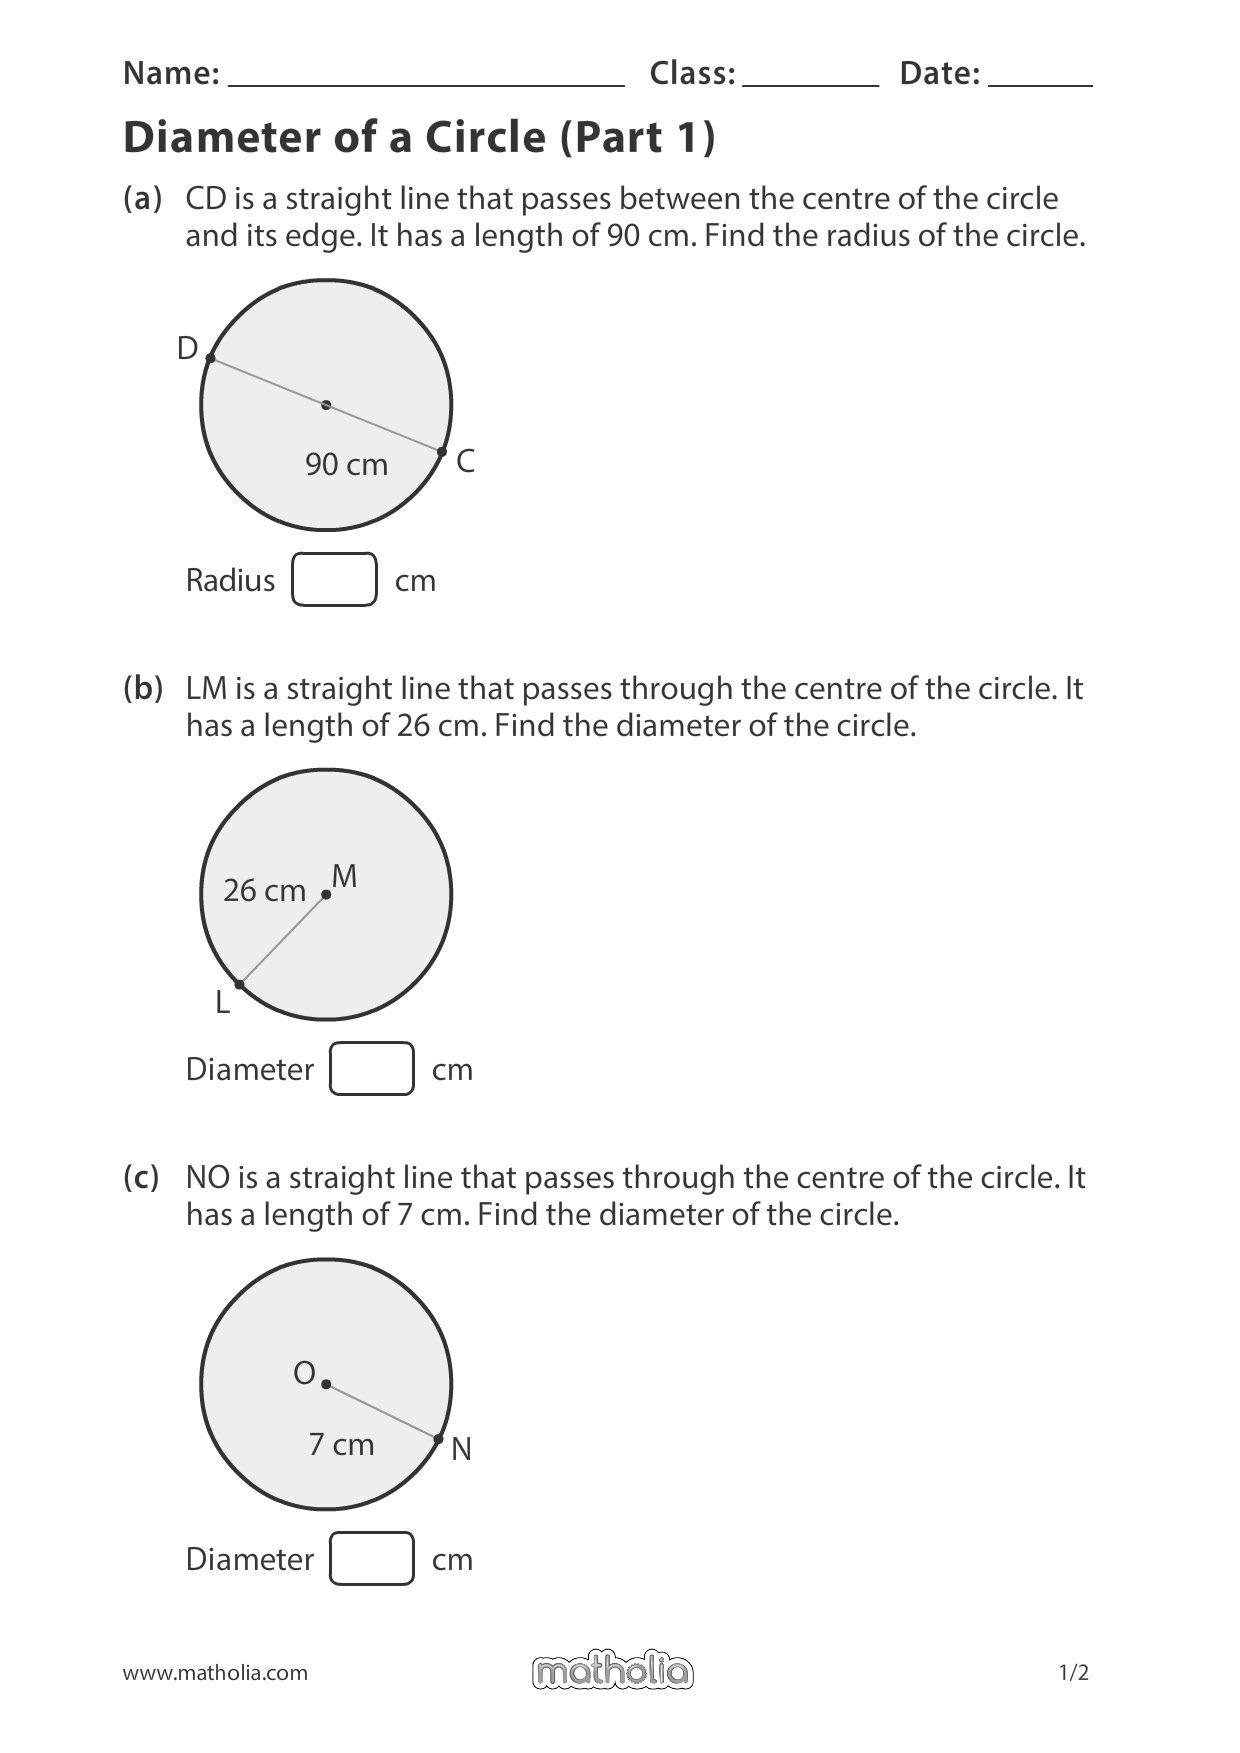 Diameter Of A Circle Part 1 In